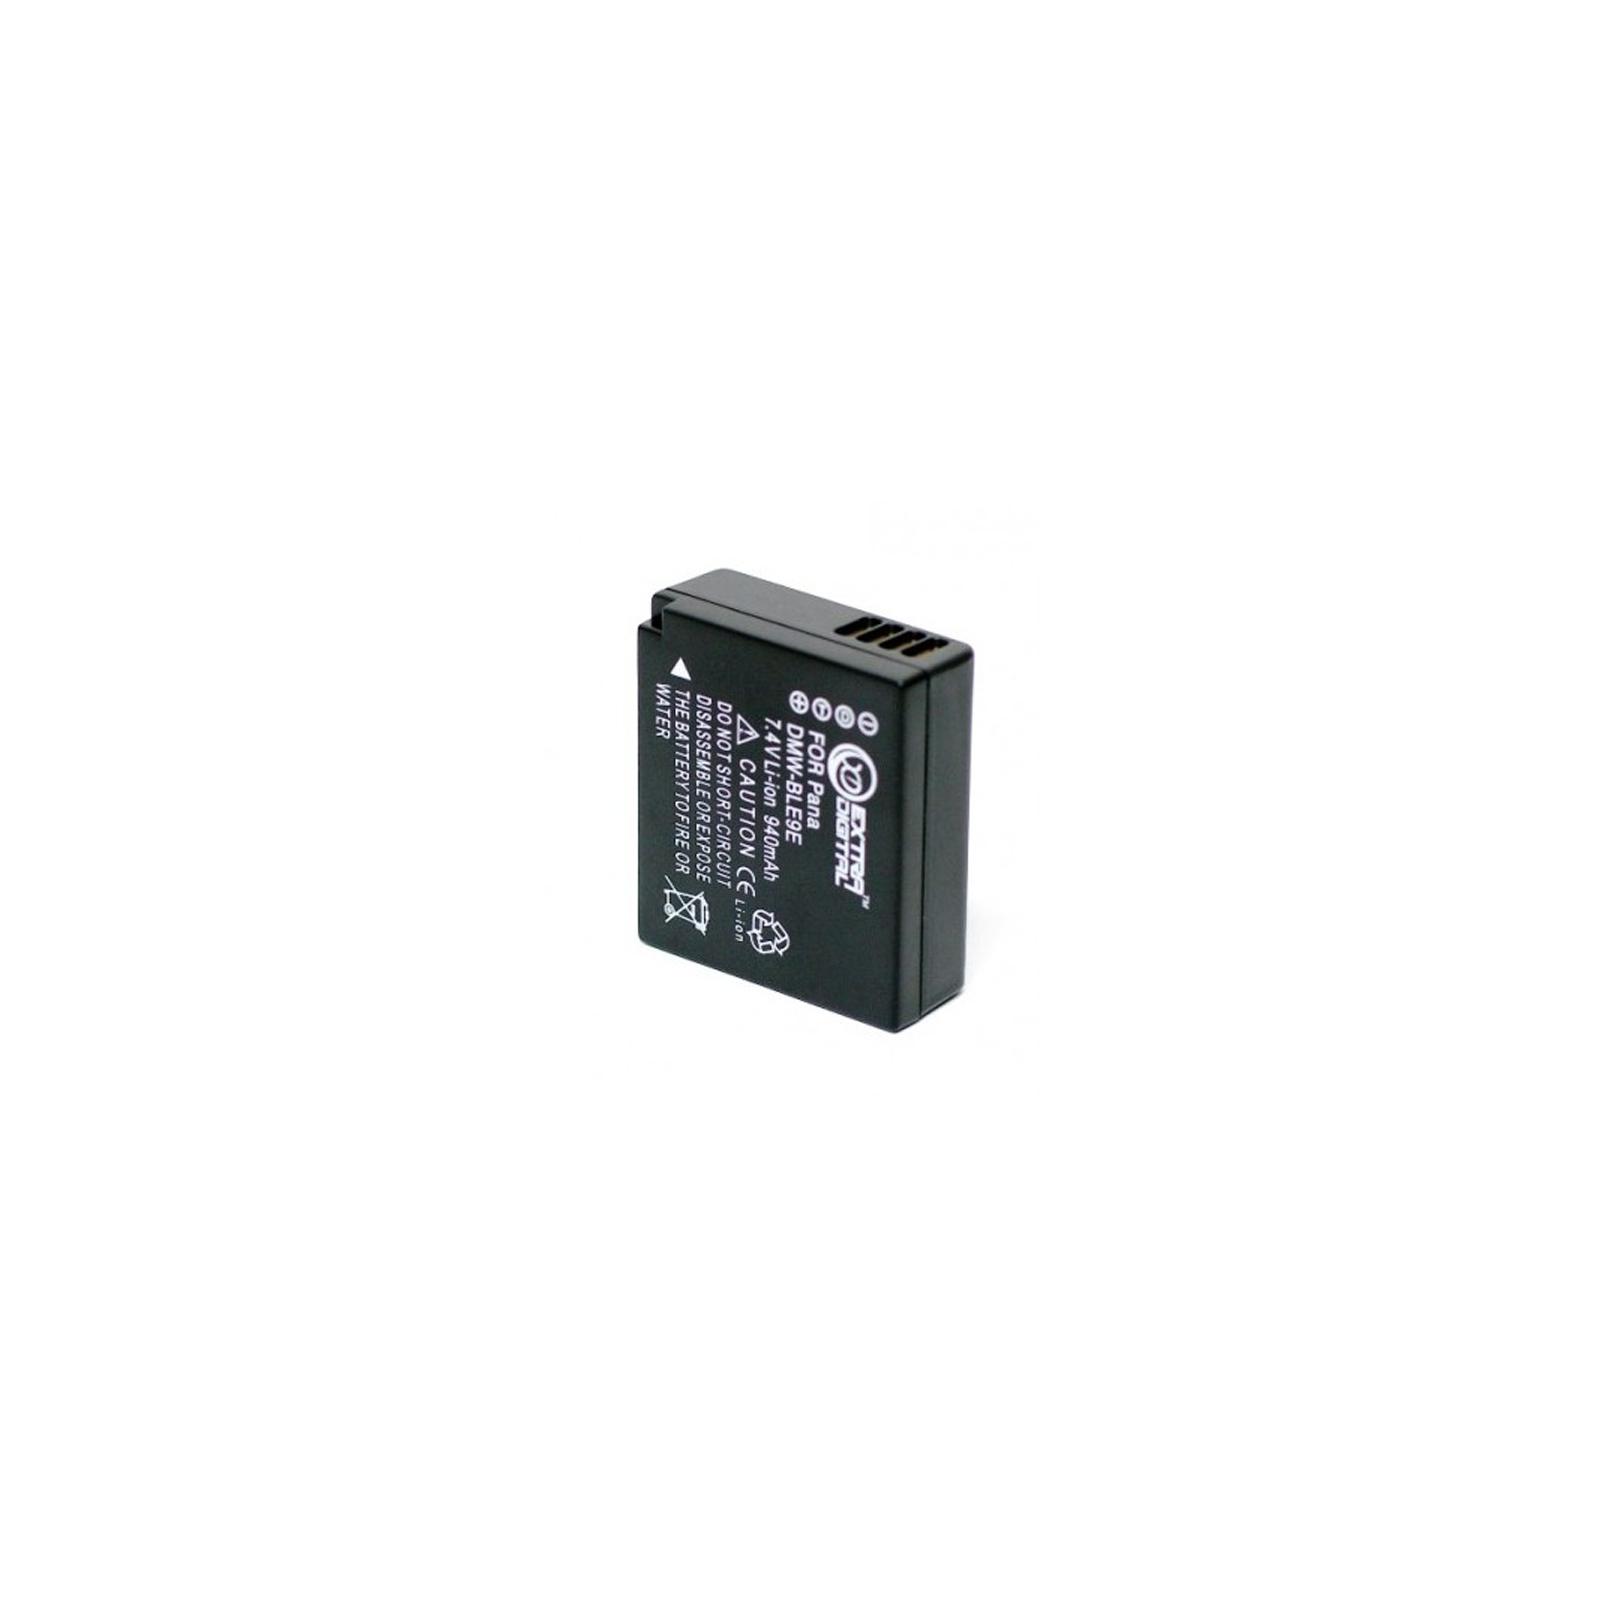 Аккумулятор к фото/видео EXTRADIGITAL Panasonic DMW-BLE9 (BDP2569) изображение 2